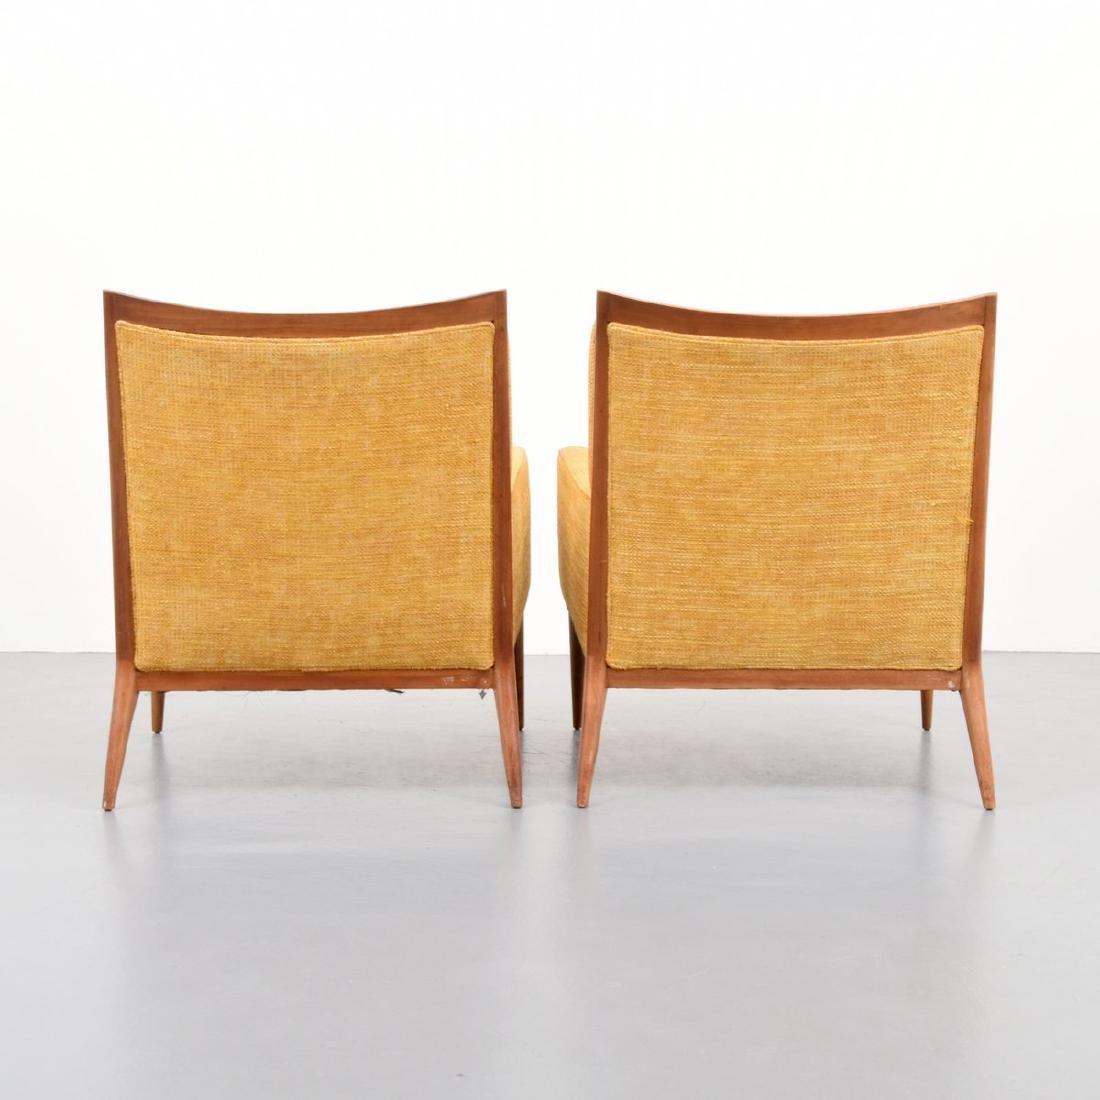 Pair of Paul McCobb Lounge Chairs - 3